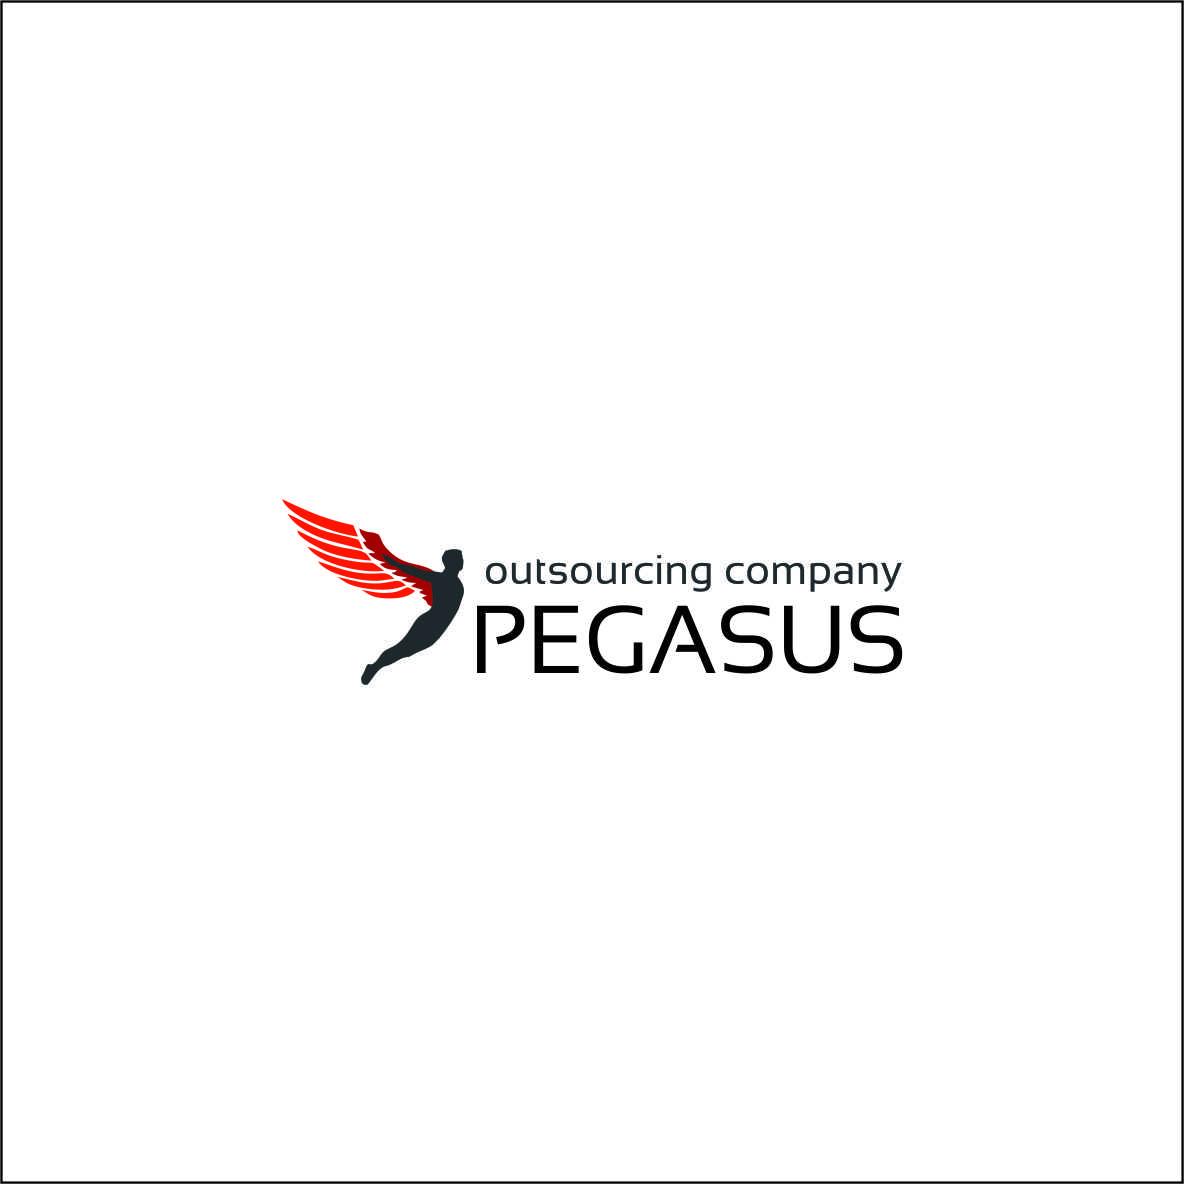 Нейминг и логотип компании, занимающейся аутсорсингом фото f_95759d793928259a.jpg